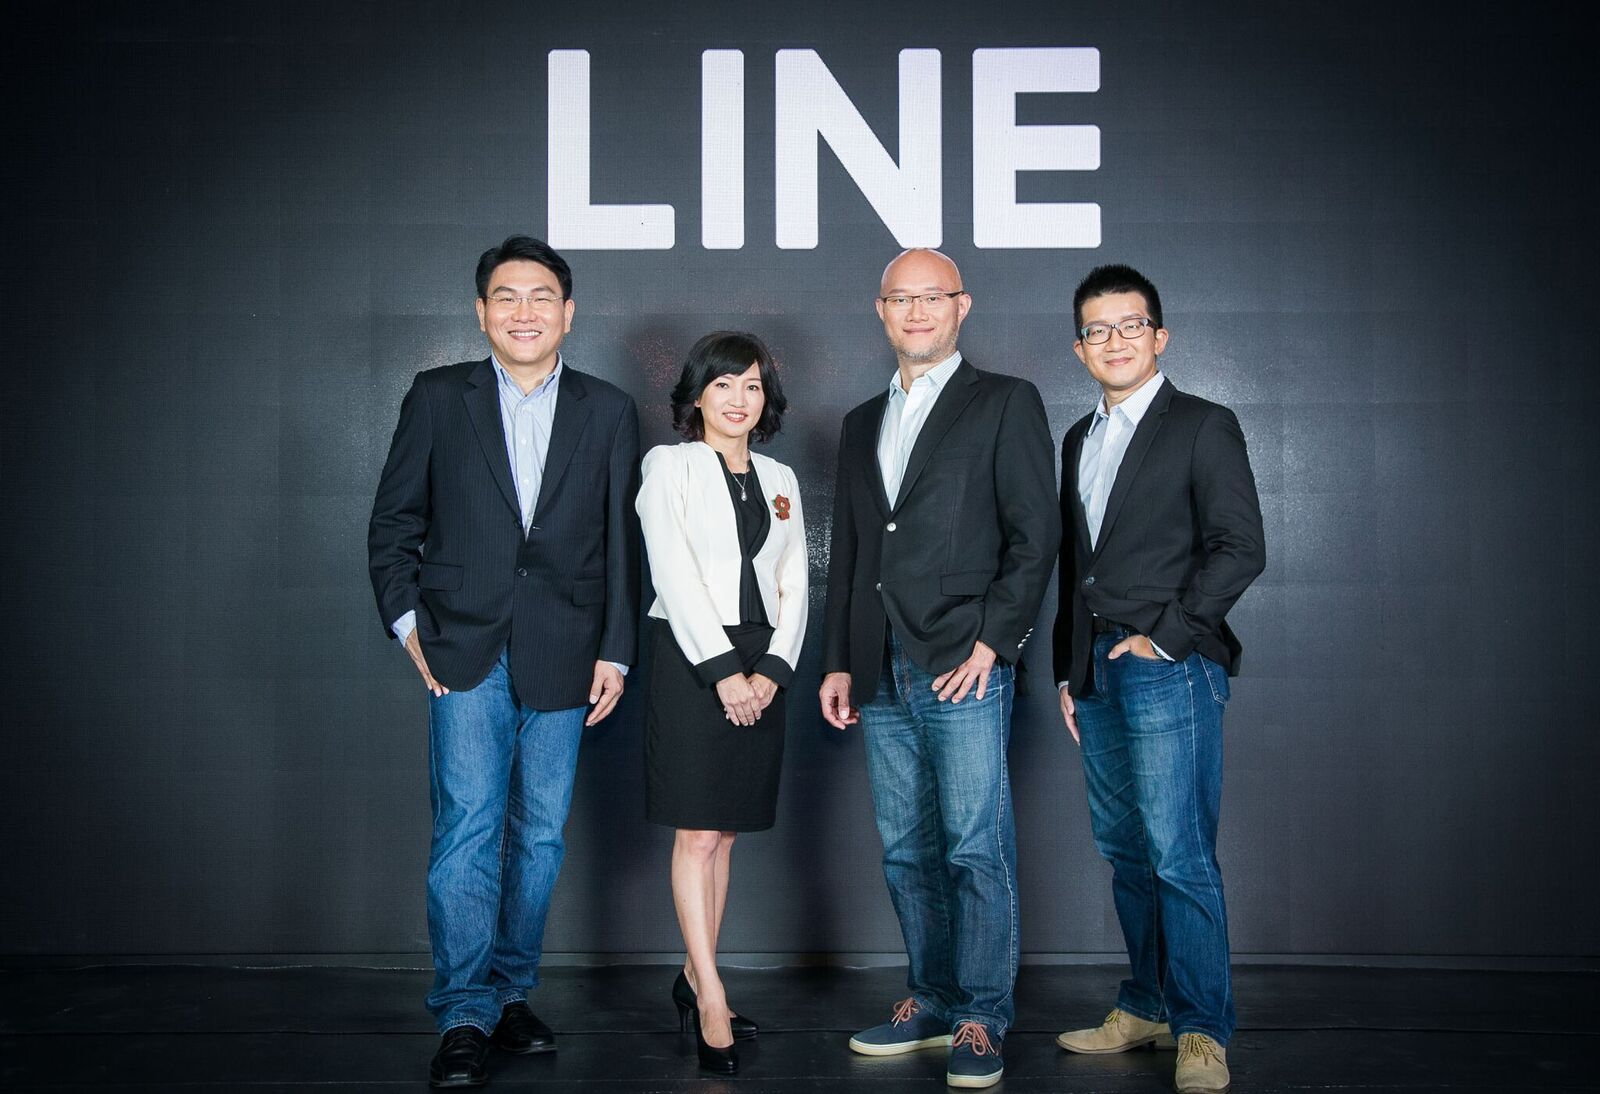 ,LINE 也正式宣布加入雙 11 購物節促銷活動